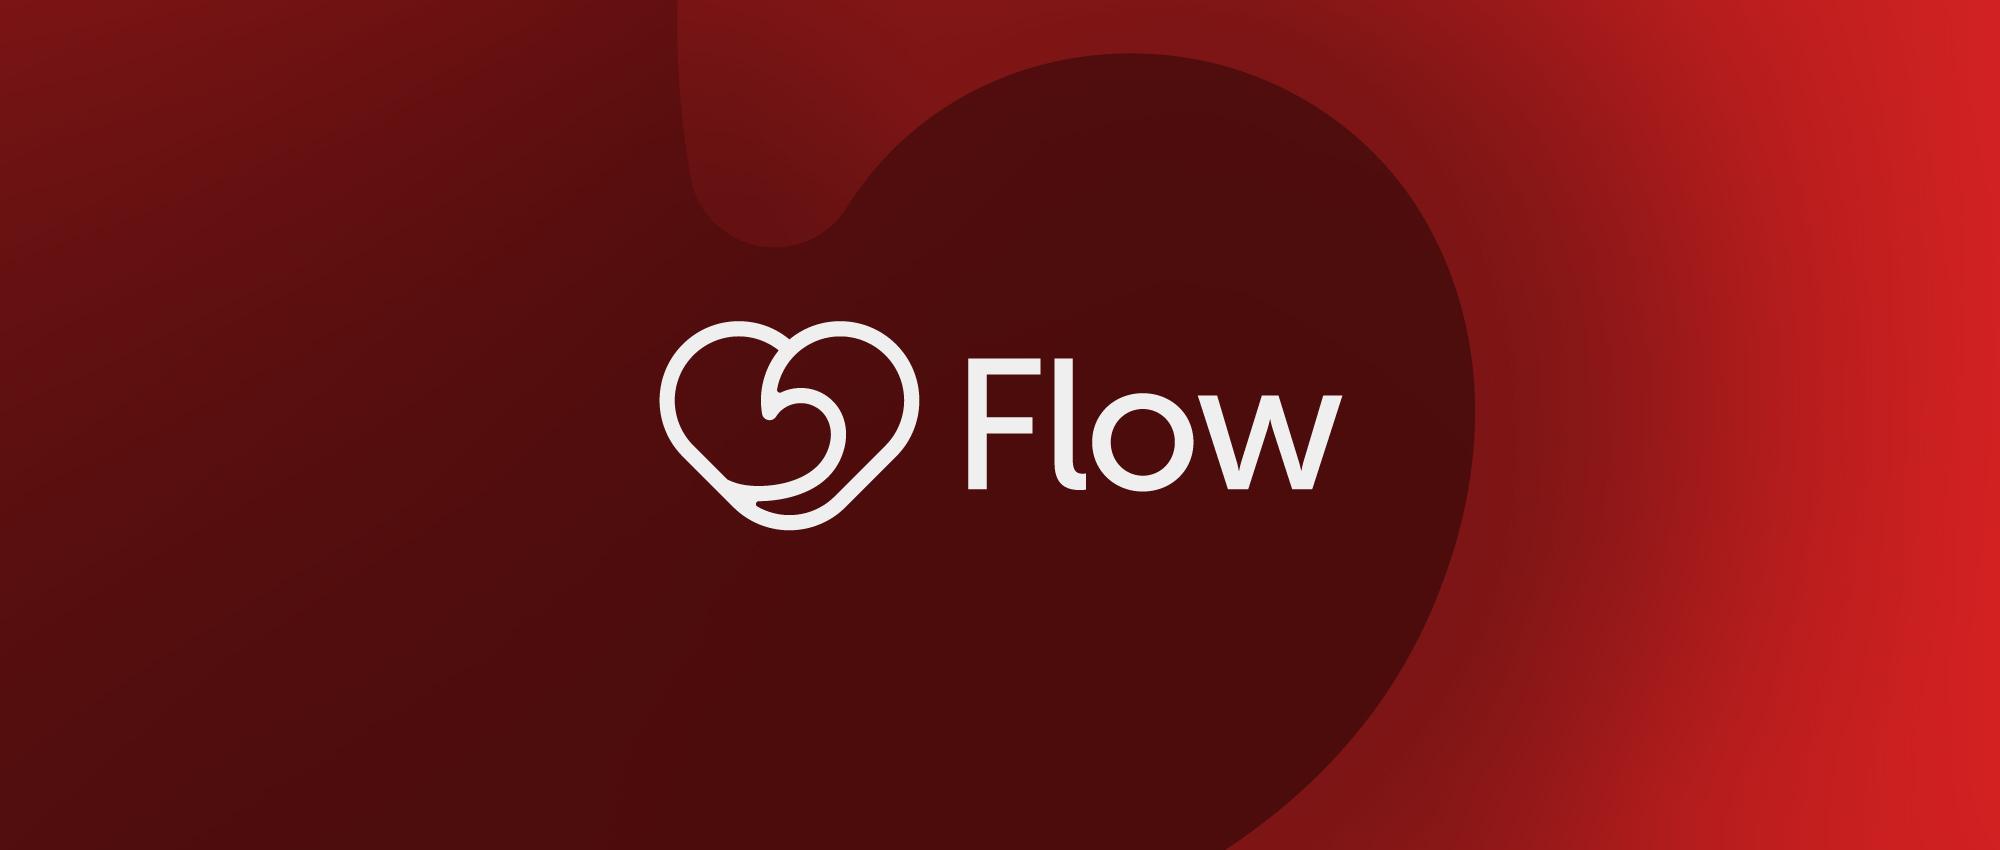 Flow_Lockup_LetterboxRatio